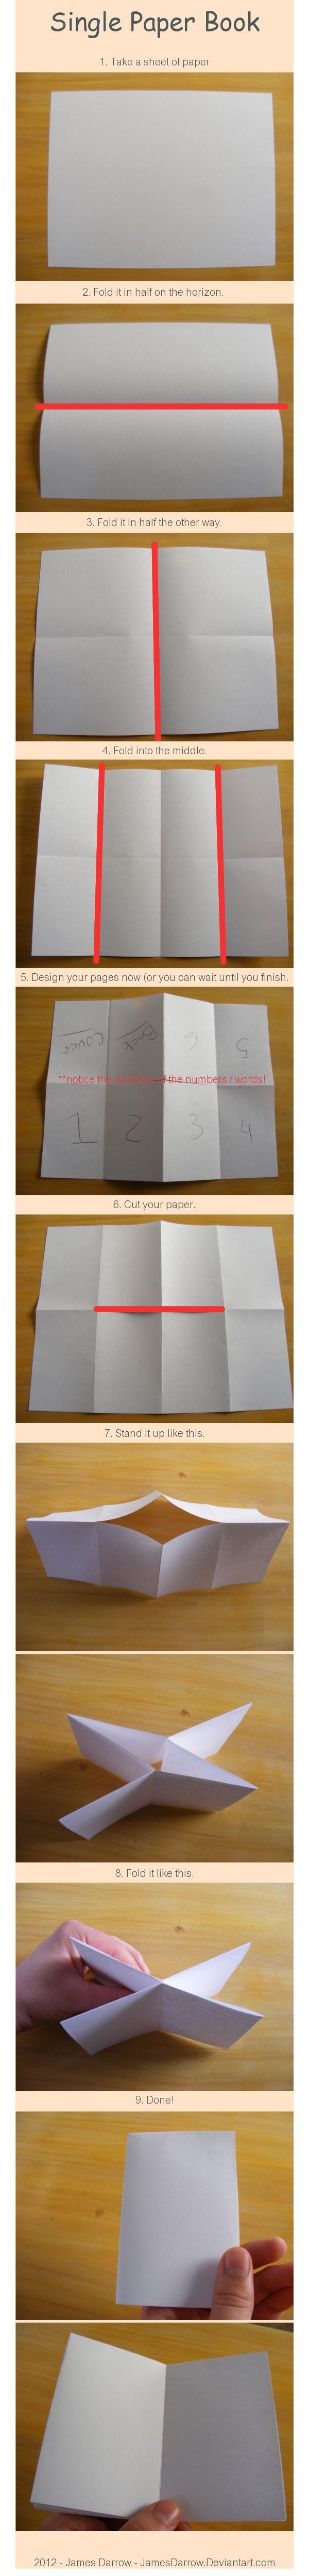 Single sheet of paper = mini book